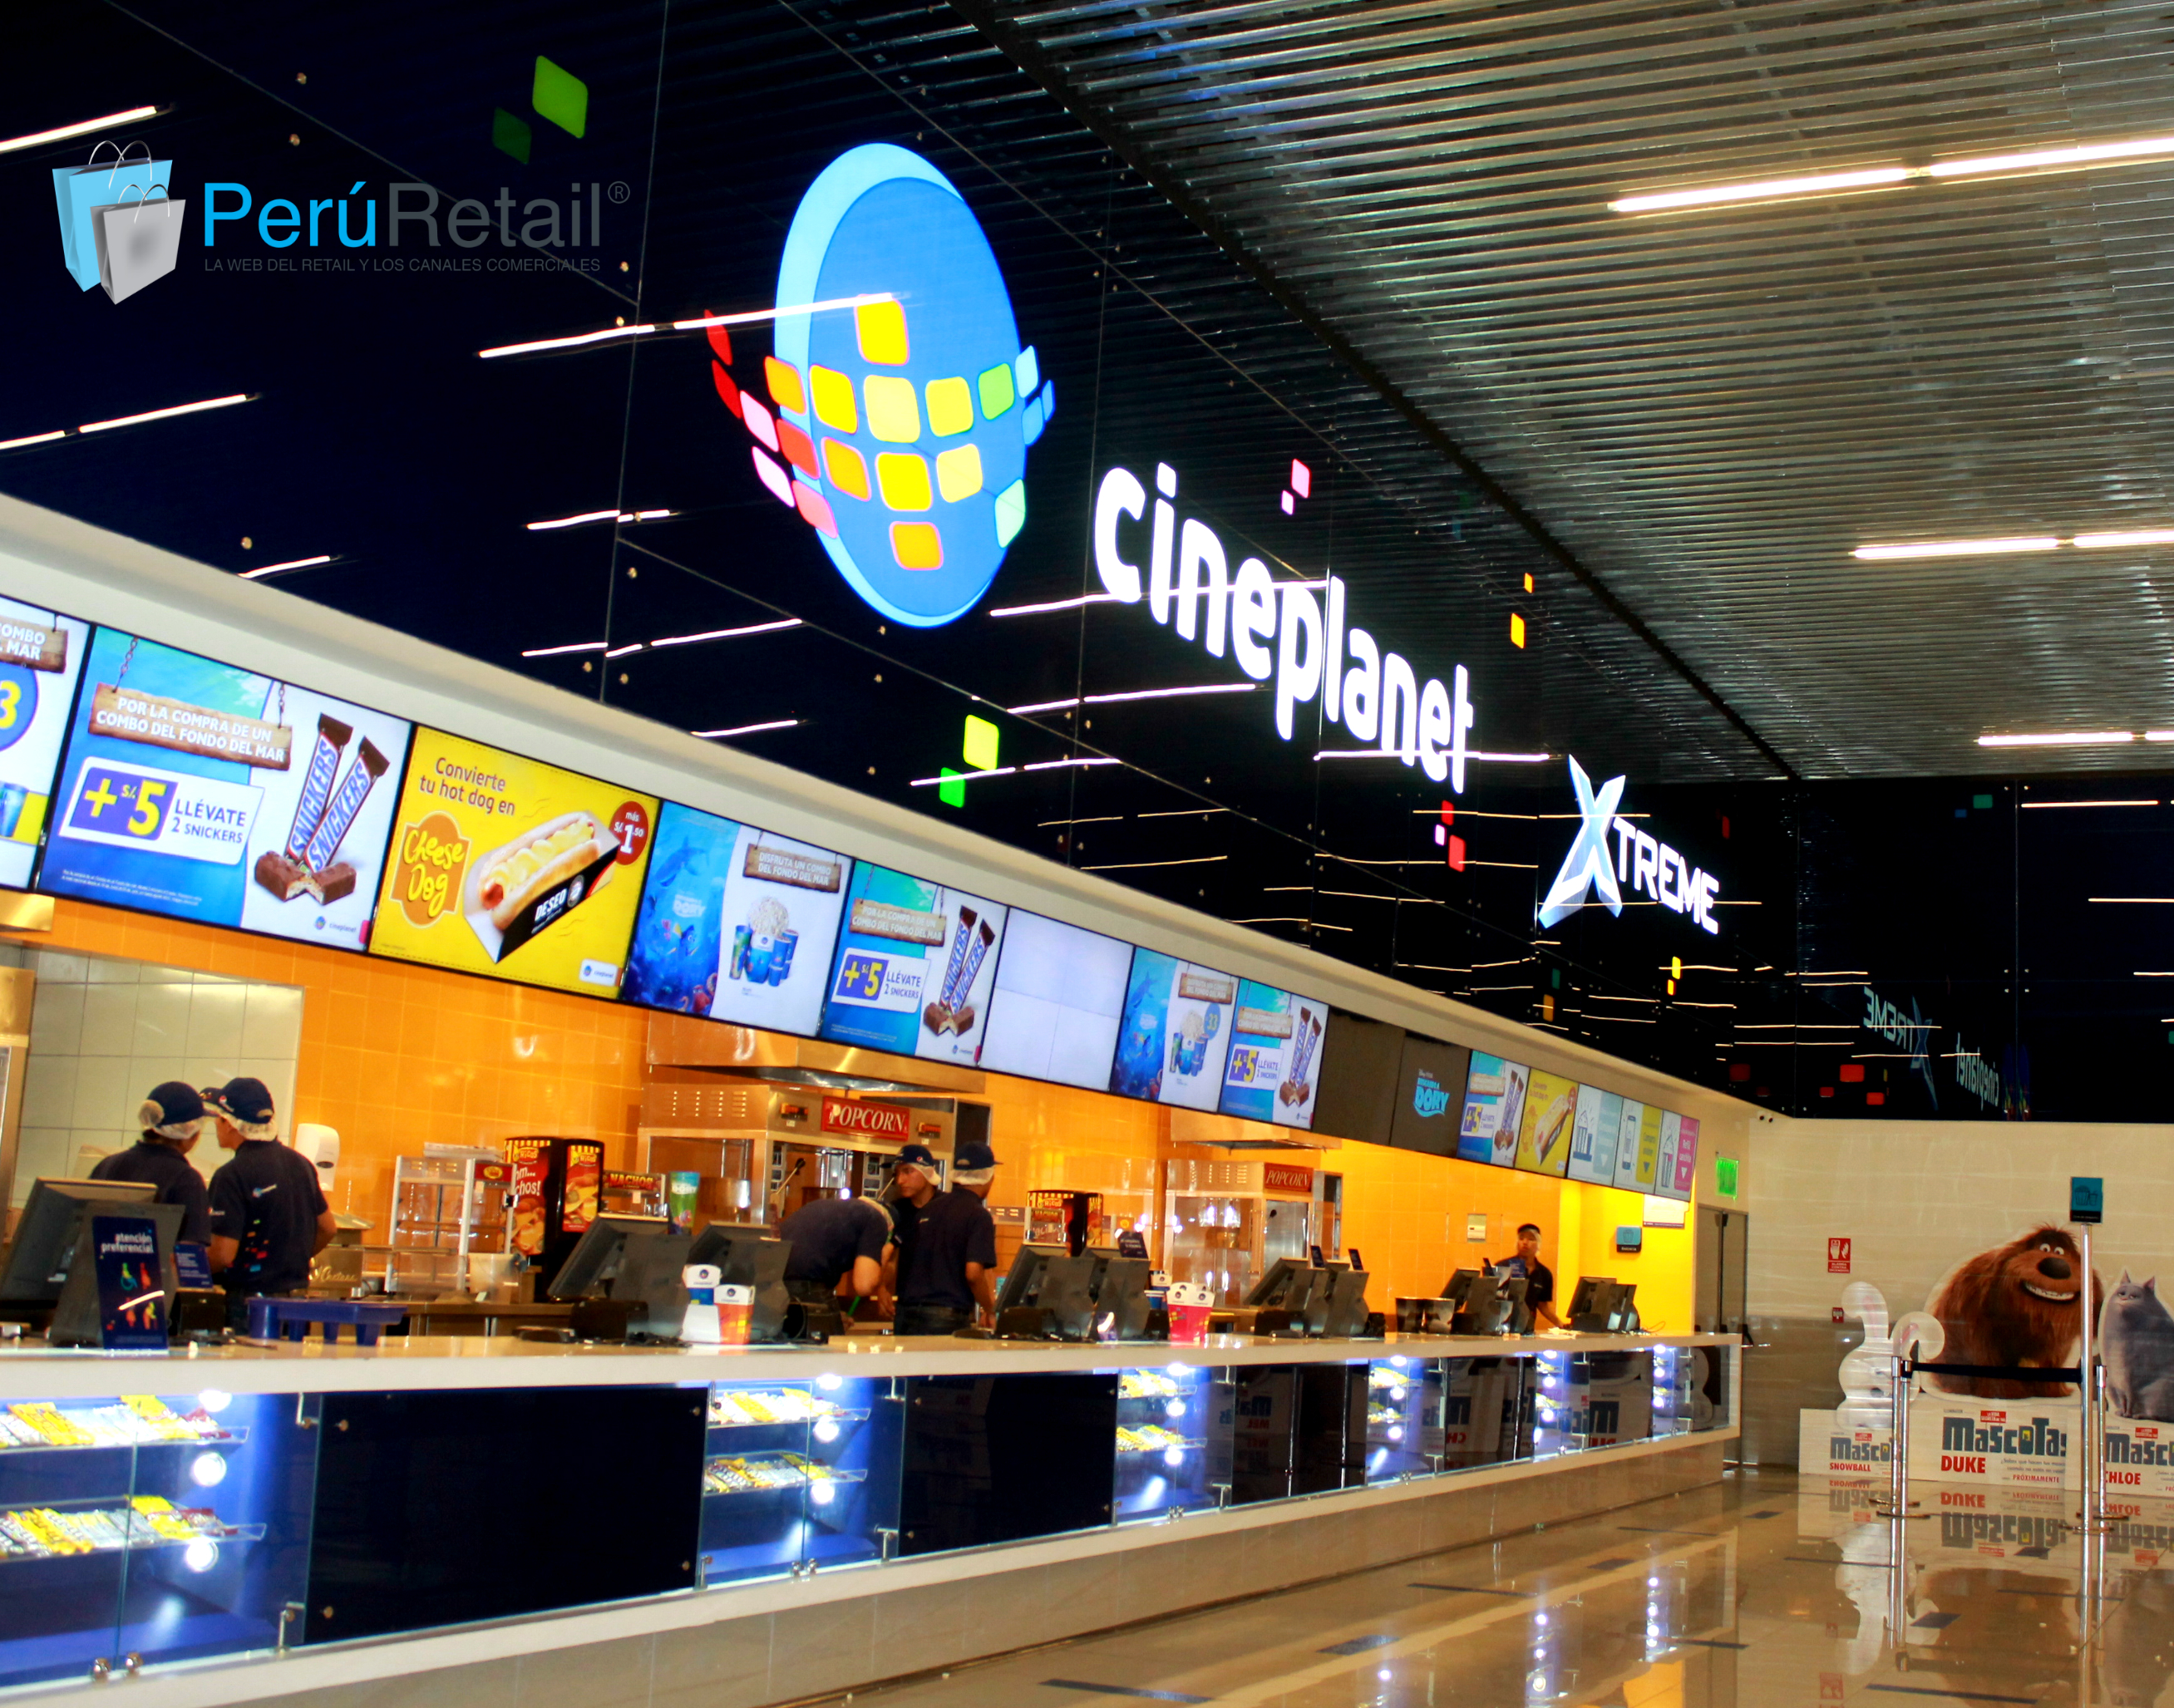 Cineplanet 89 Peru Retail